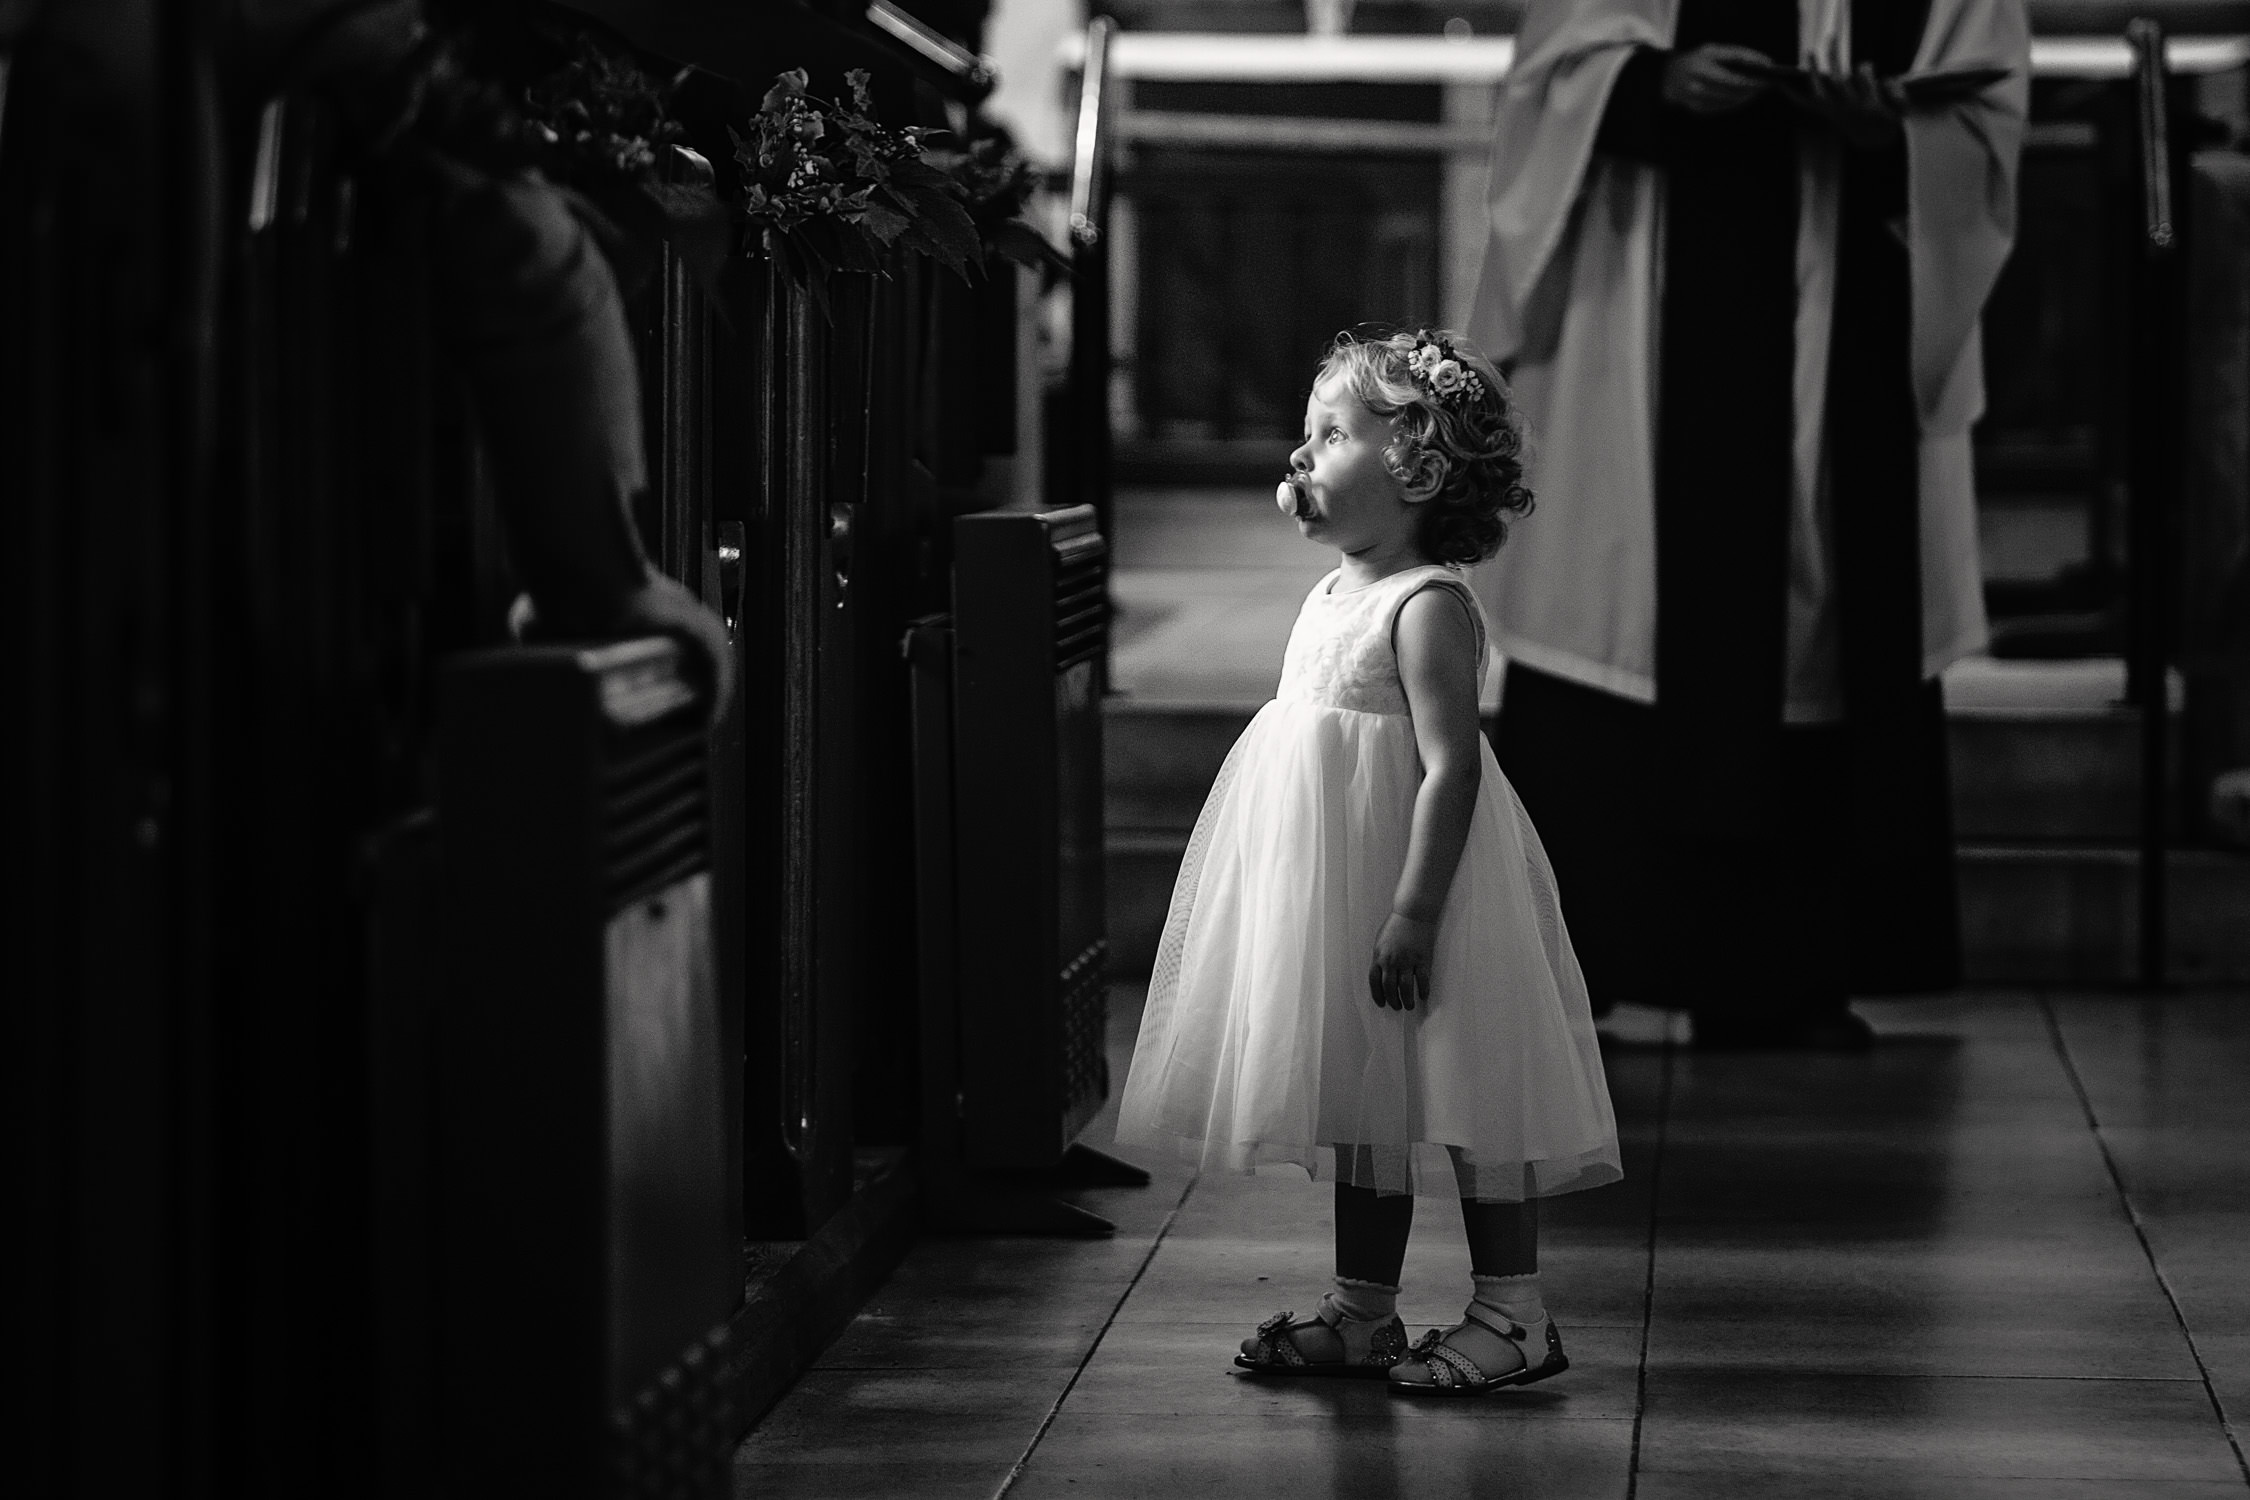 flower girl in the church aisle